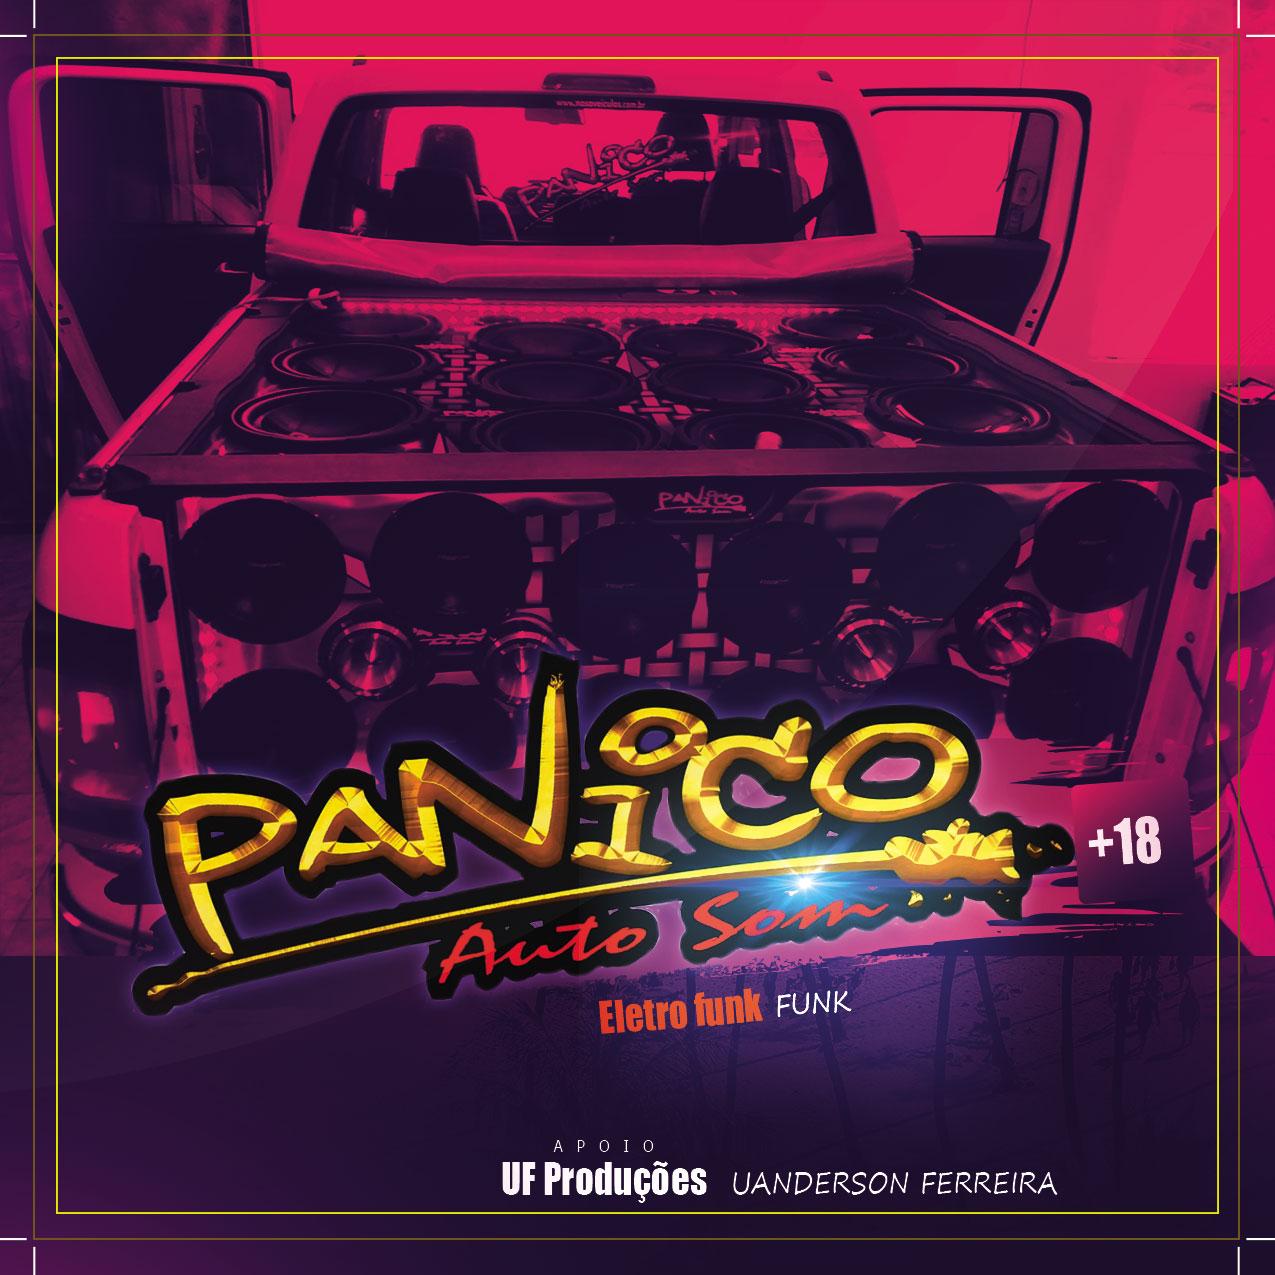 CD Panico Auto Som